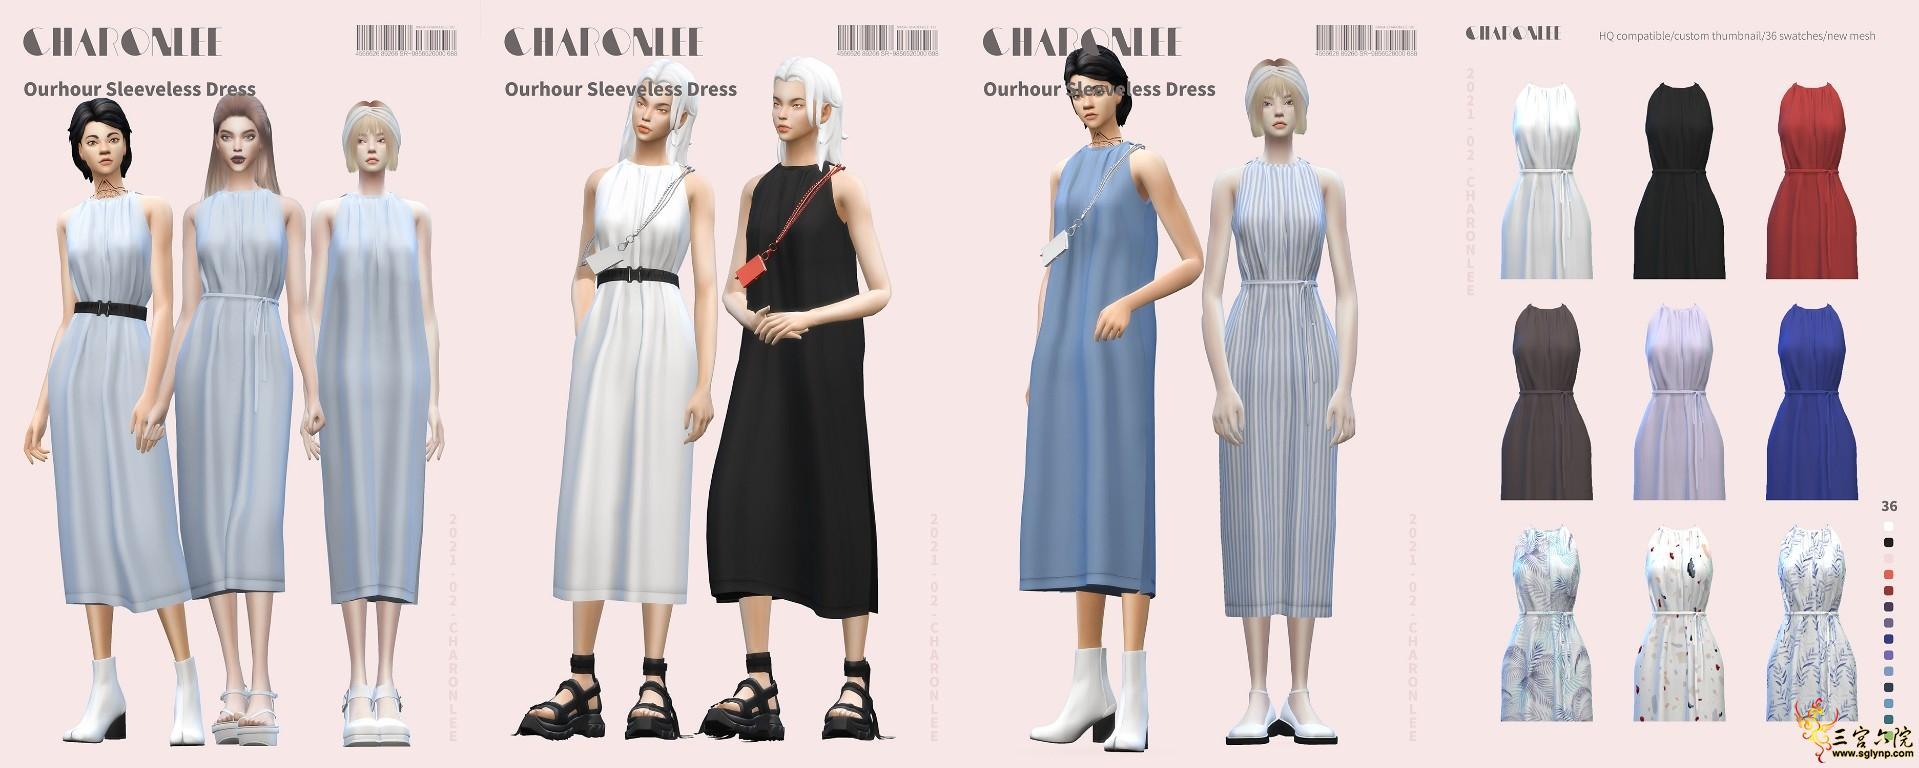 [CHARONLEE]2021-016-Ourhour Sleeveless Dress.jpg